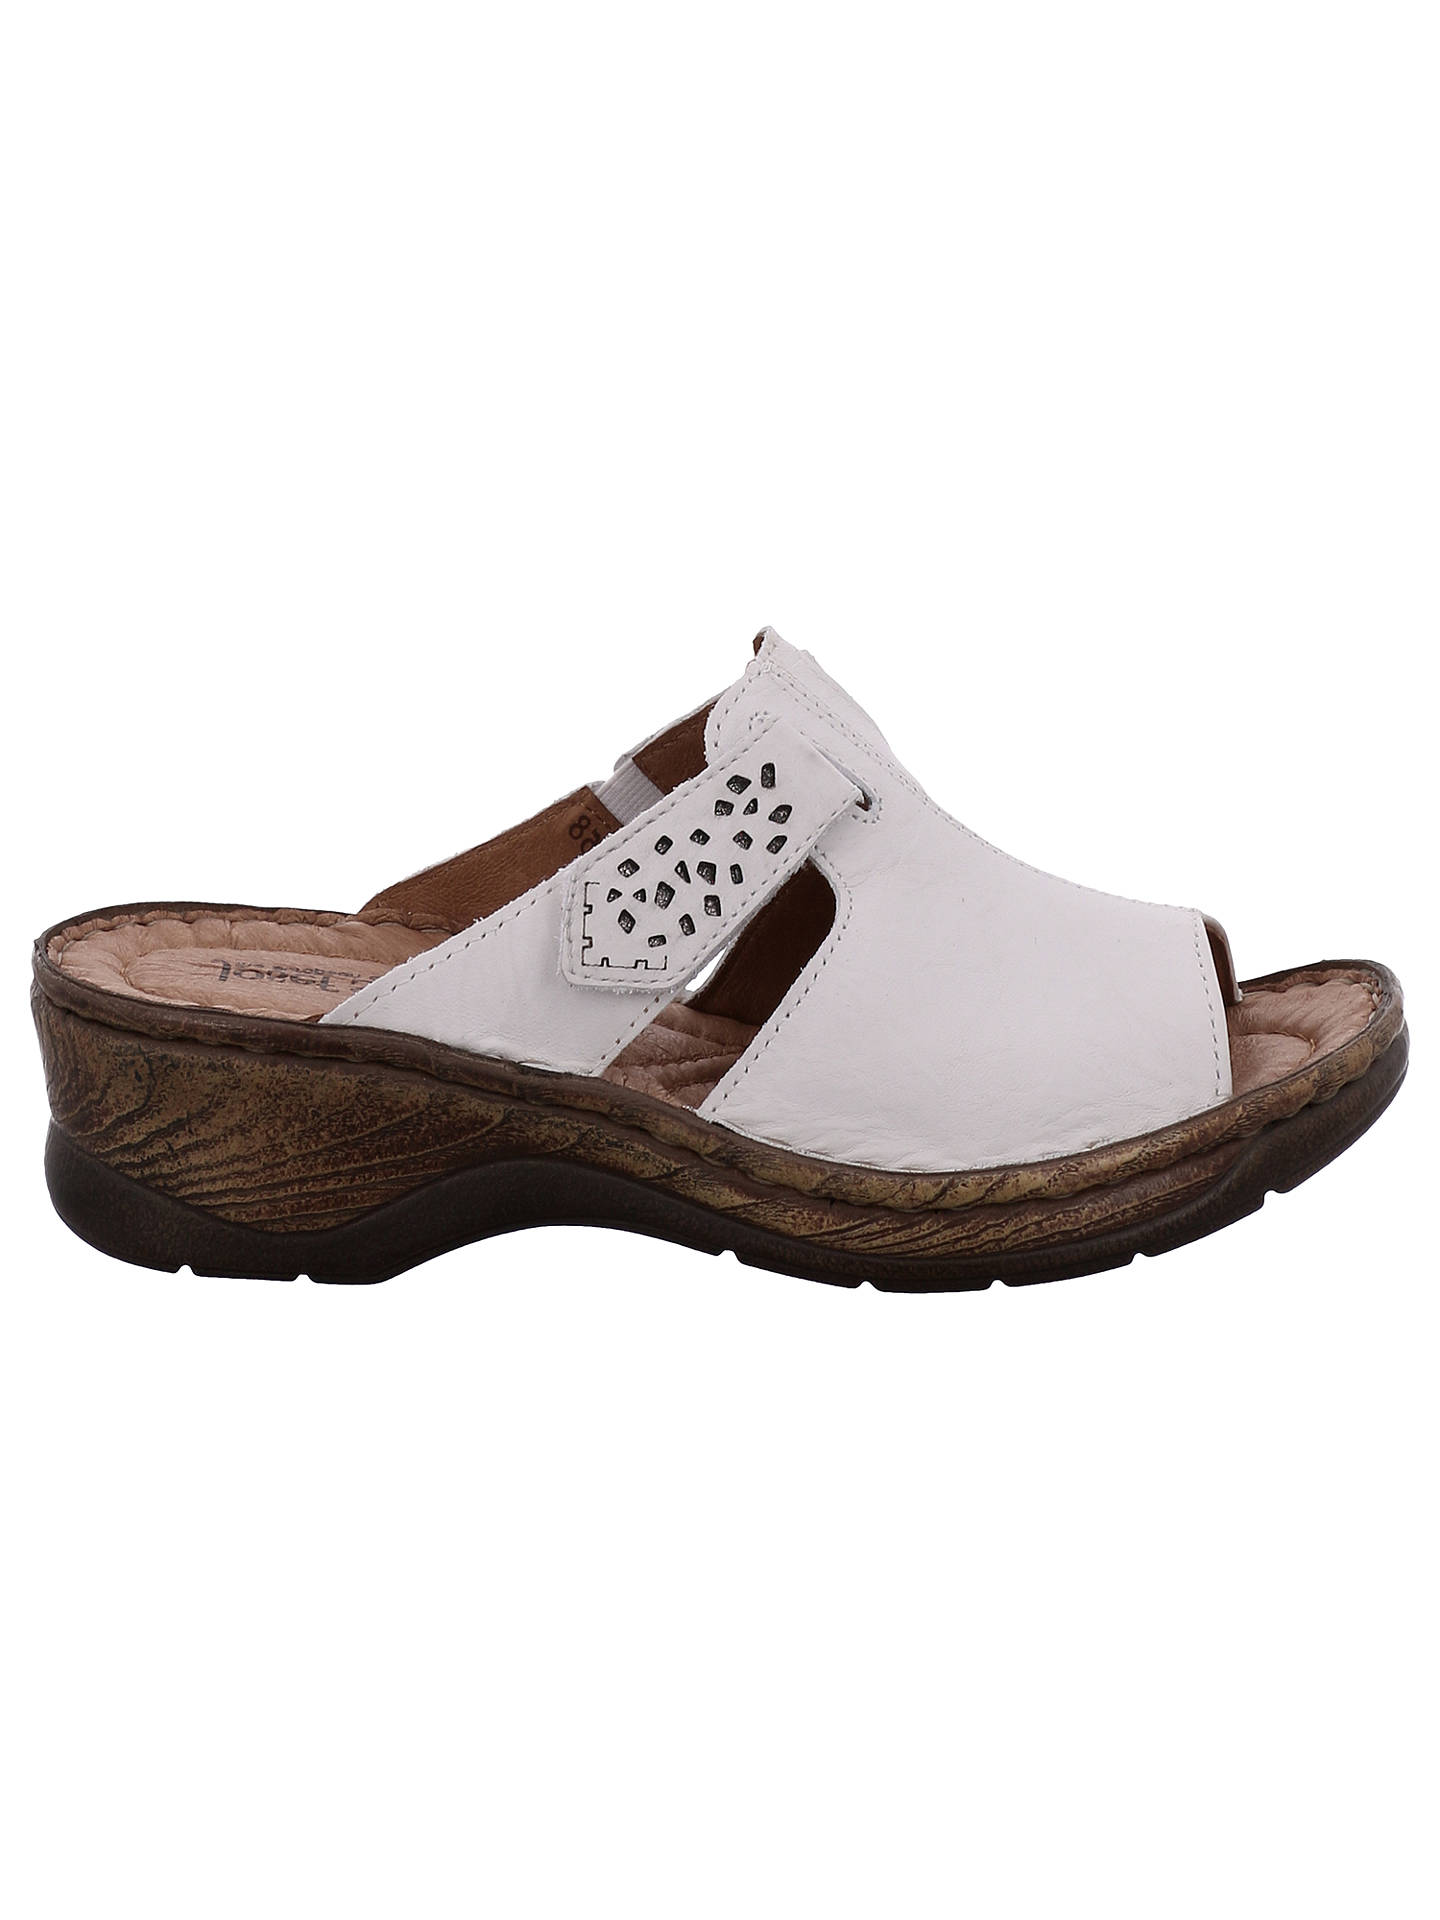 c159feb87baf9 Buy Josef Seibel Catalonia 32 Slip On Sandals, White Leather, 4 Online at  johnlewis ...